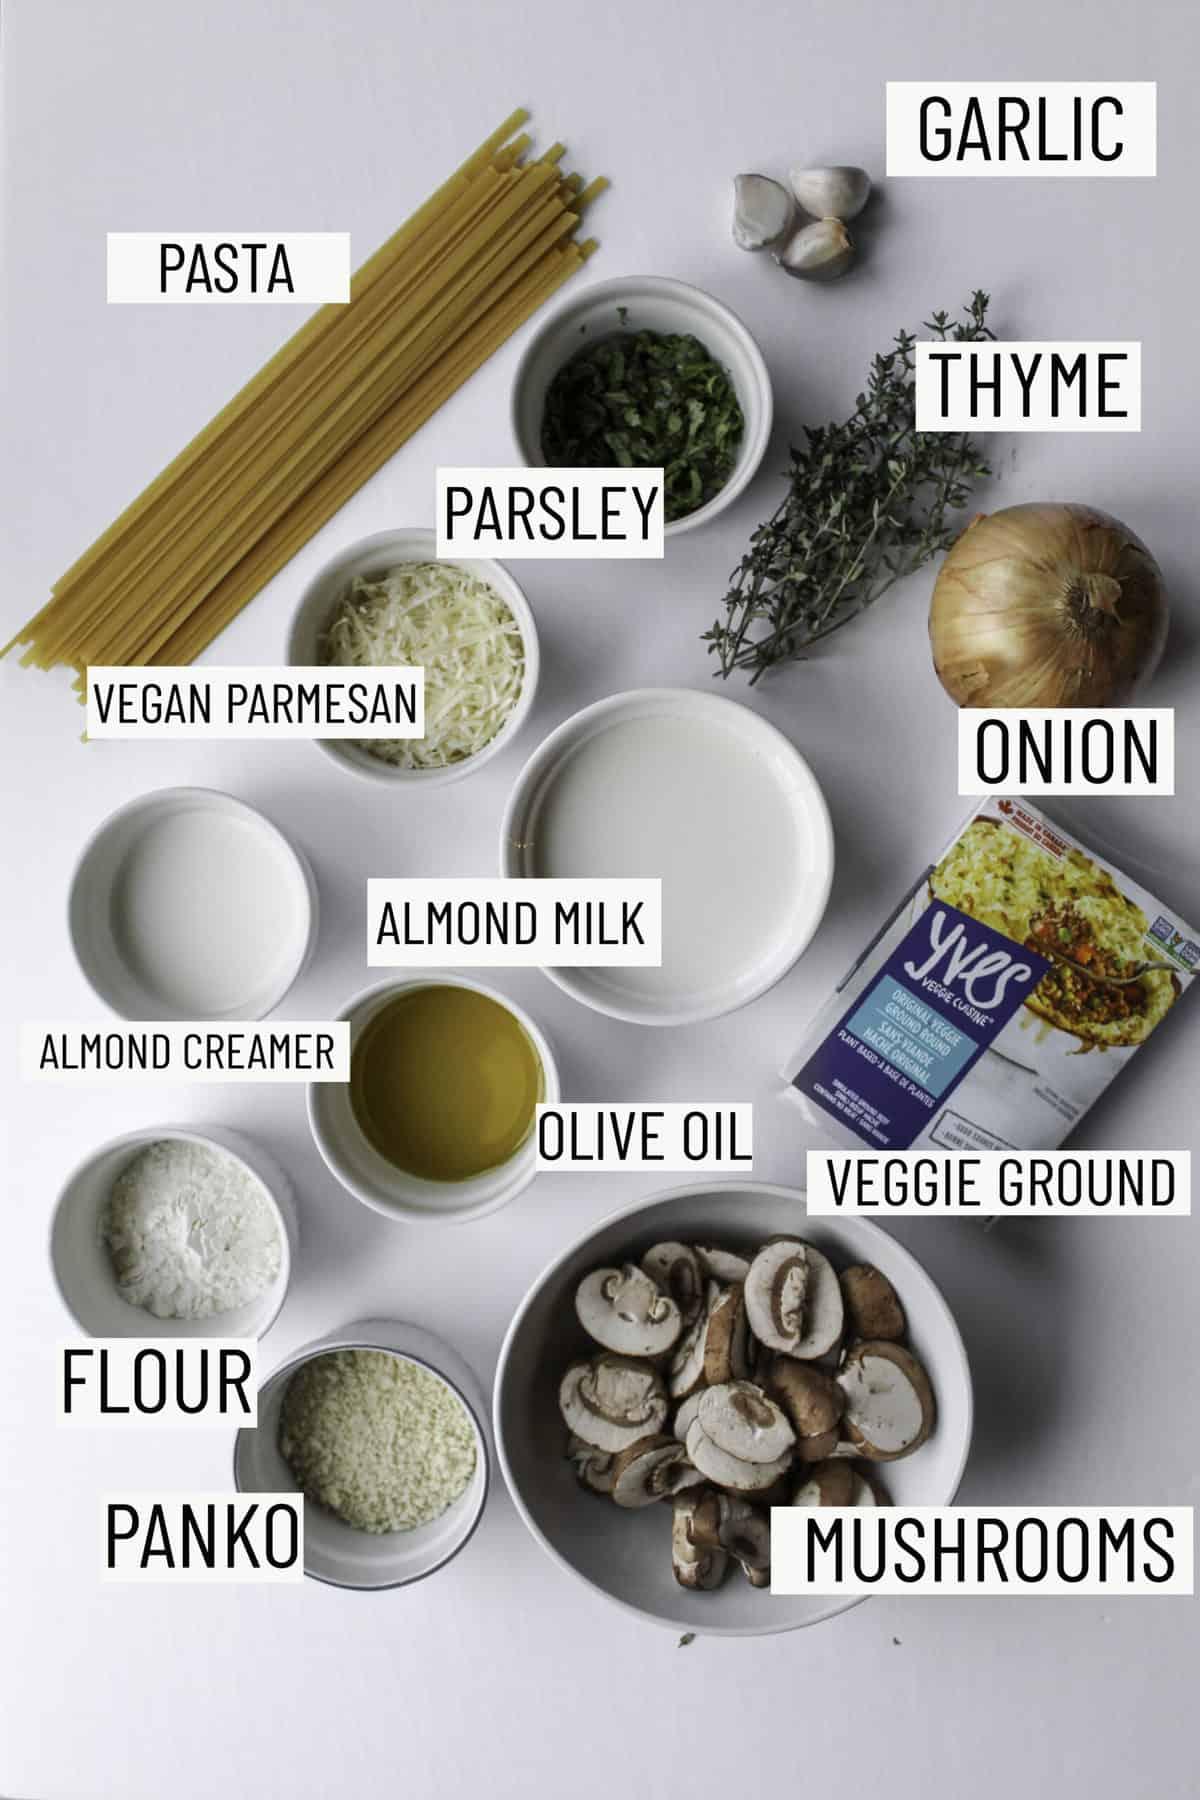 Flatlay photo of ingredients for vegan mushroom pastas: pasta, garlic, thyme, parsley, onion, vegan parmesan, almond milk, vegan milk, almond creamer, olive oil, flour, panko, and mushrooms.